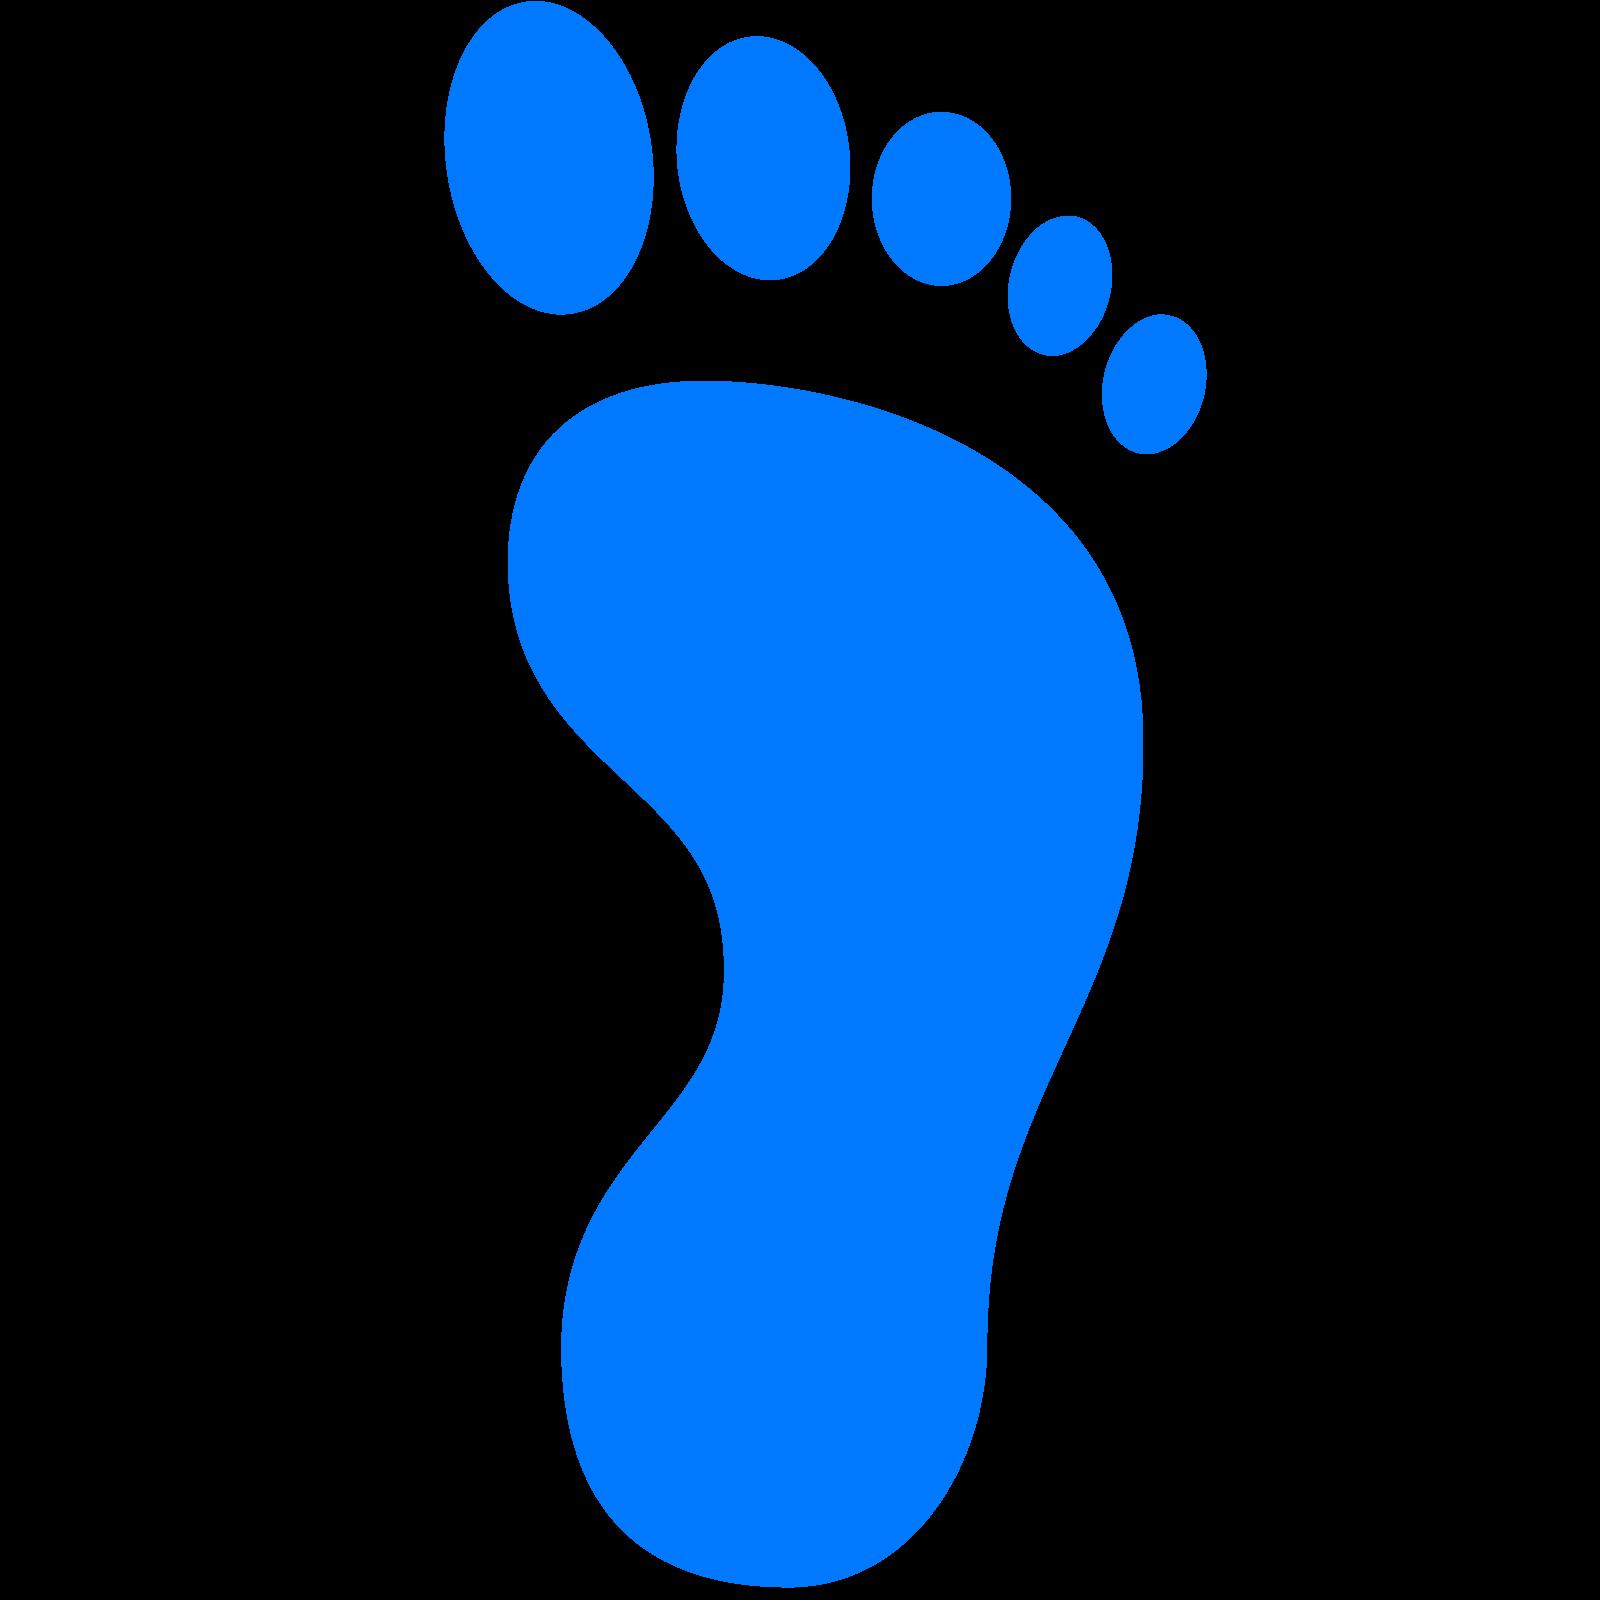 Footprints clipart blue. Computer icons footprint clip